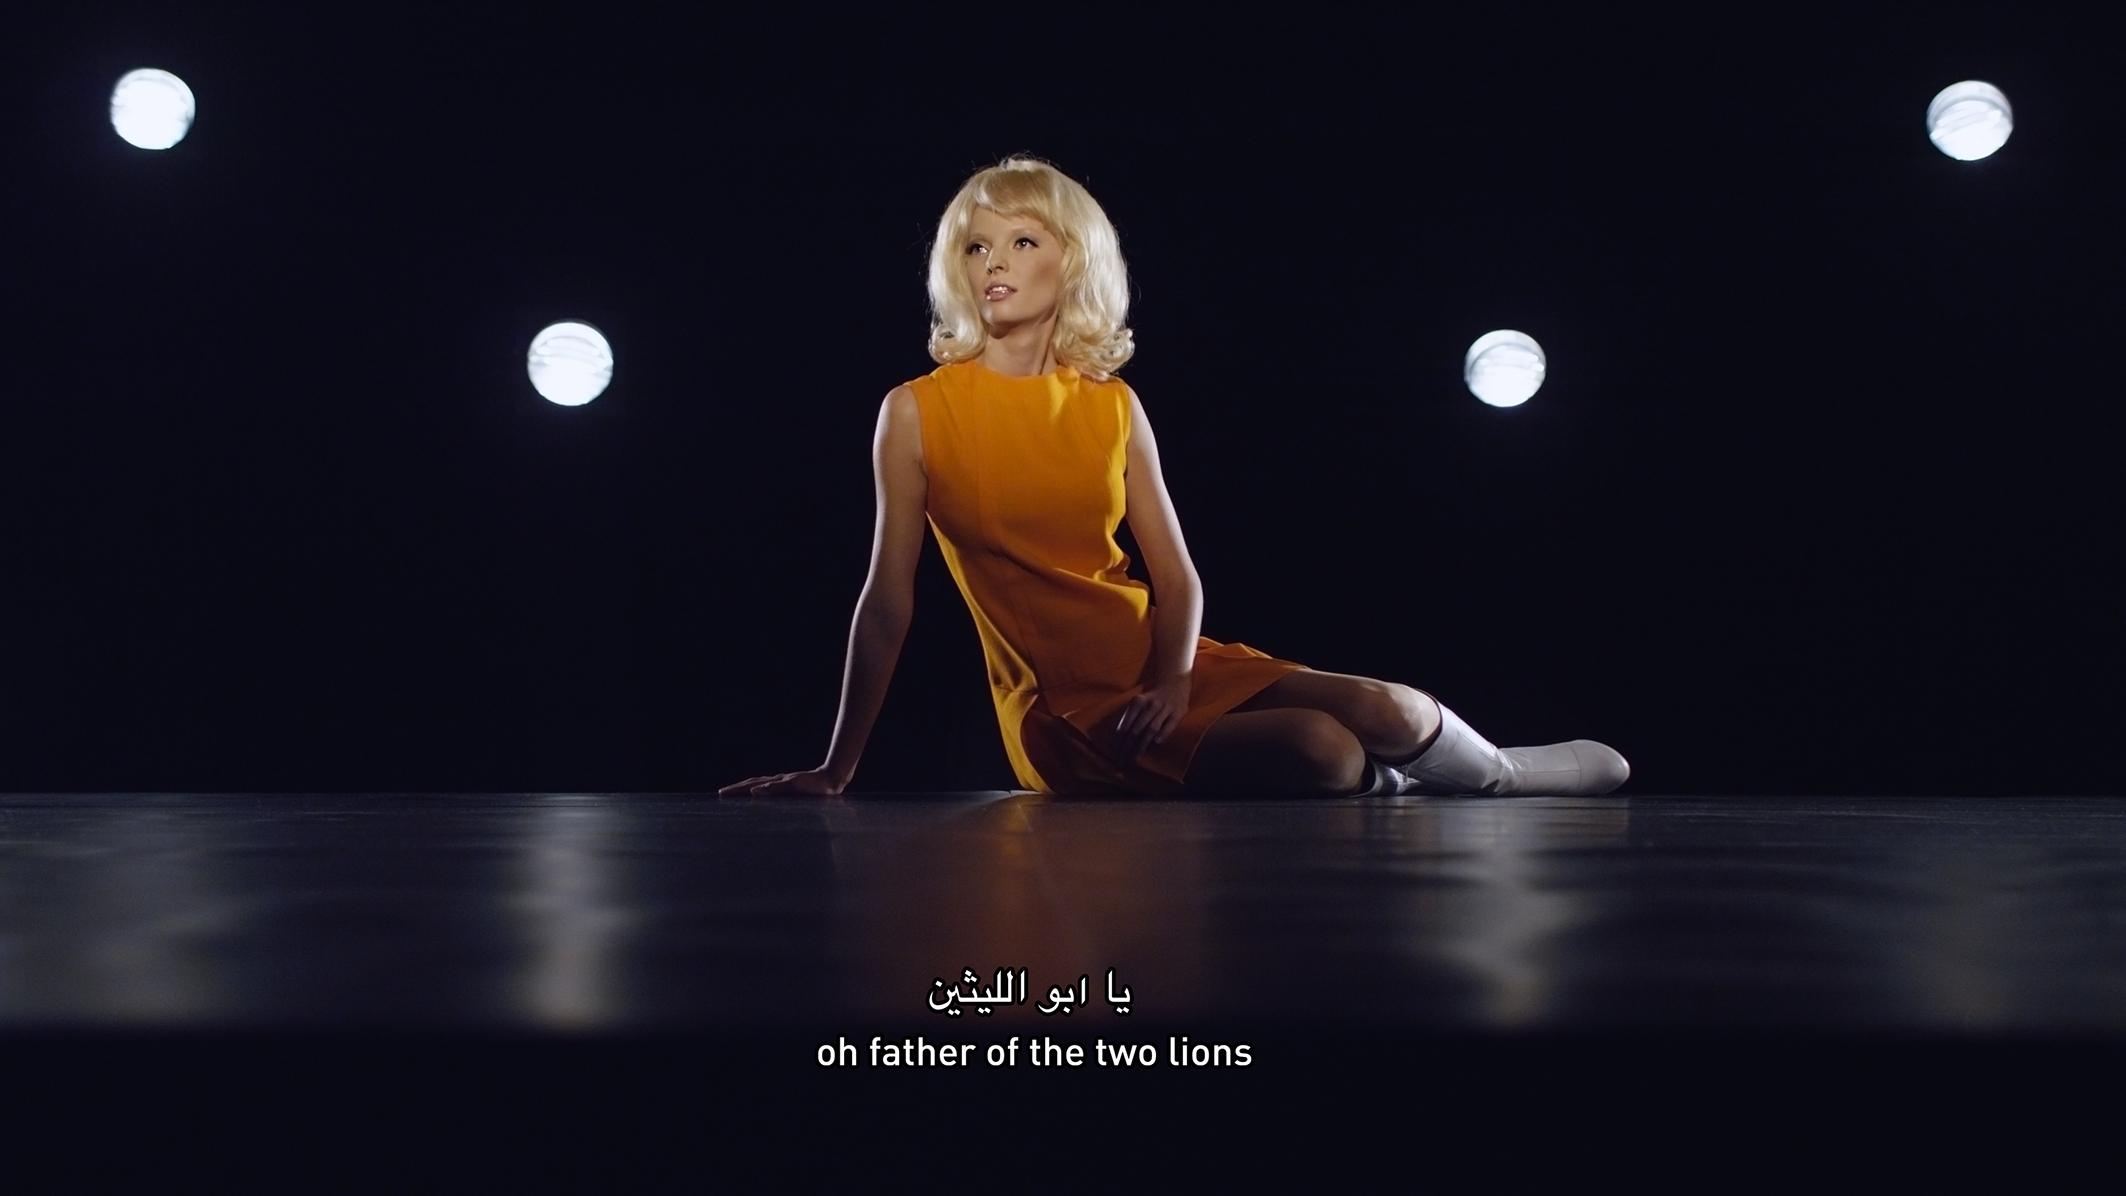 Three Love Songs, Adel Abidin,2010